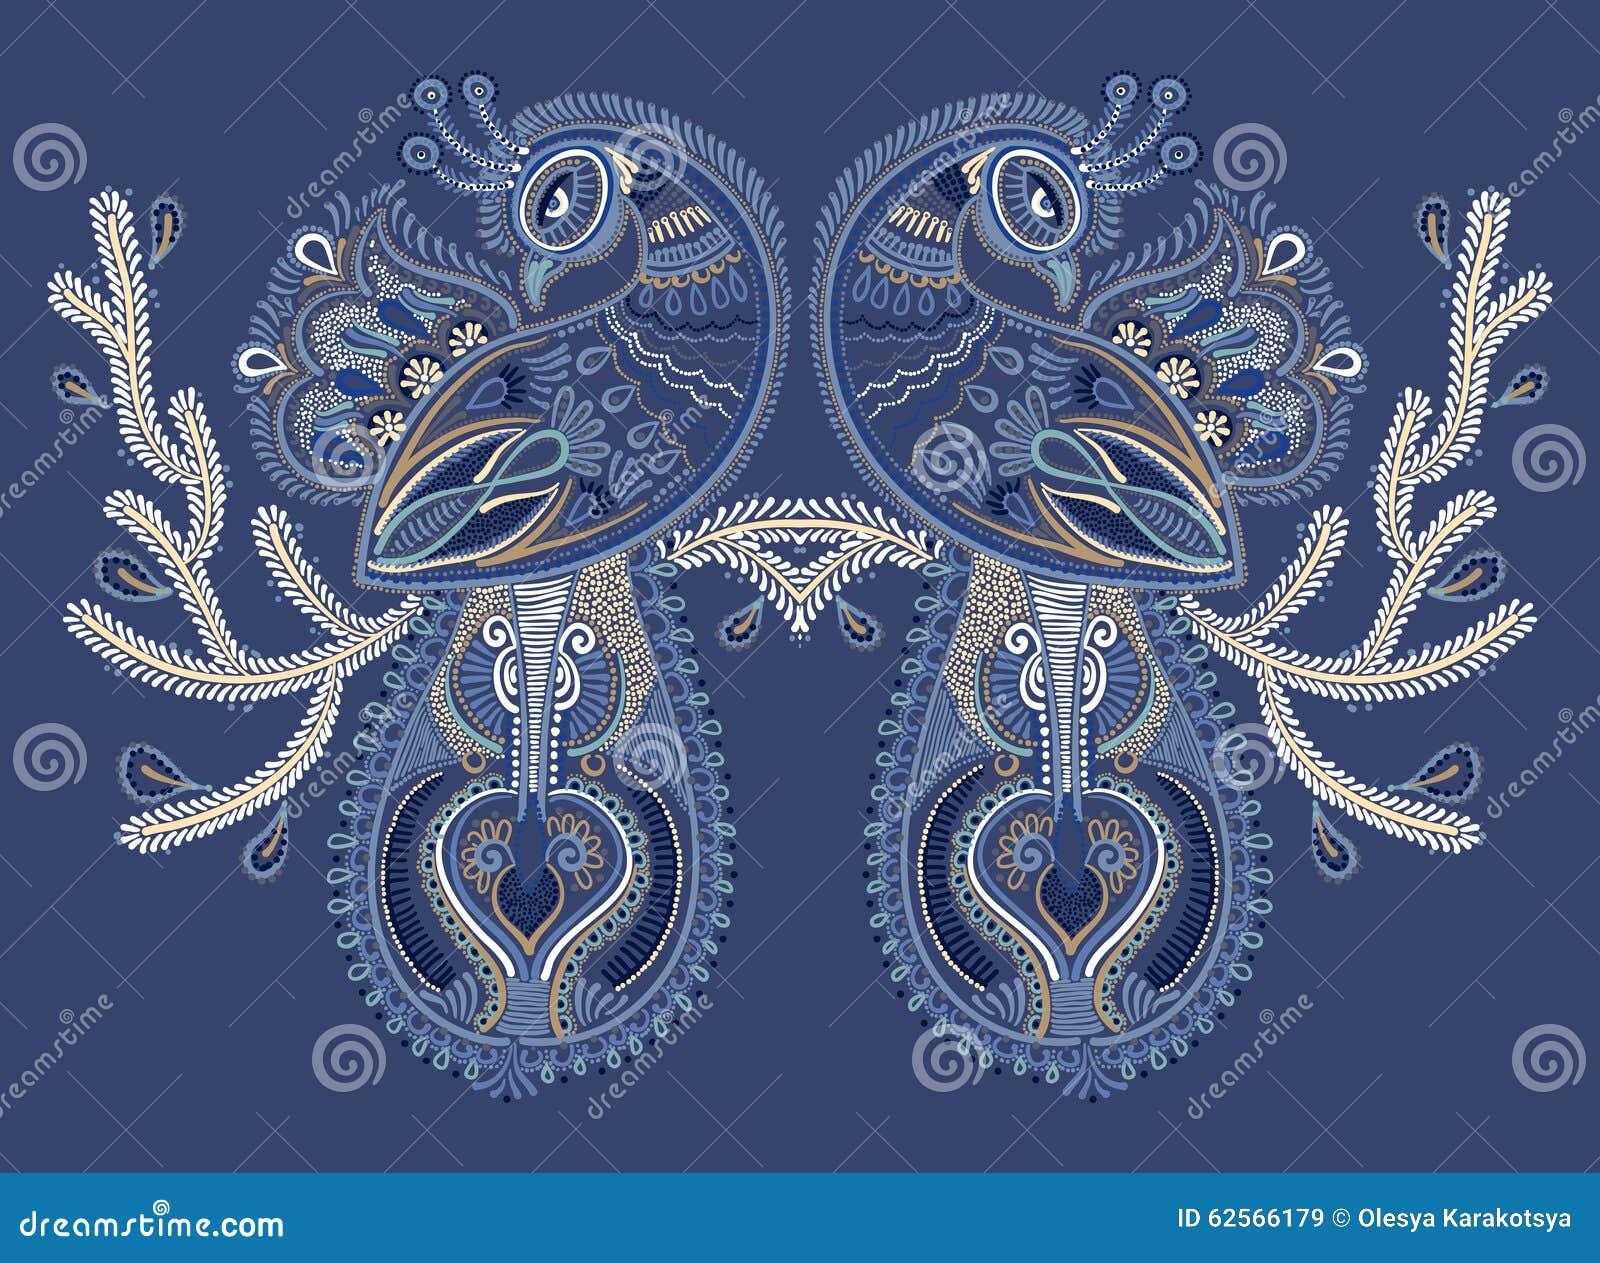 Ethnic Folk Art Of Two Peacock Bird With Flowering Stock